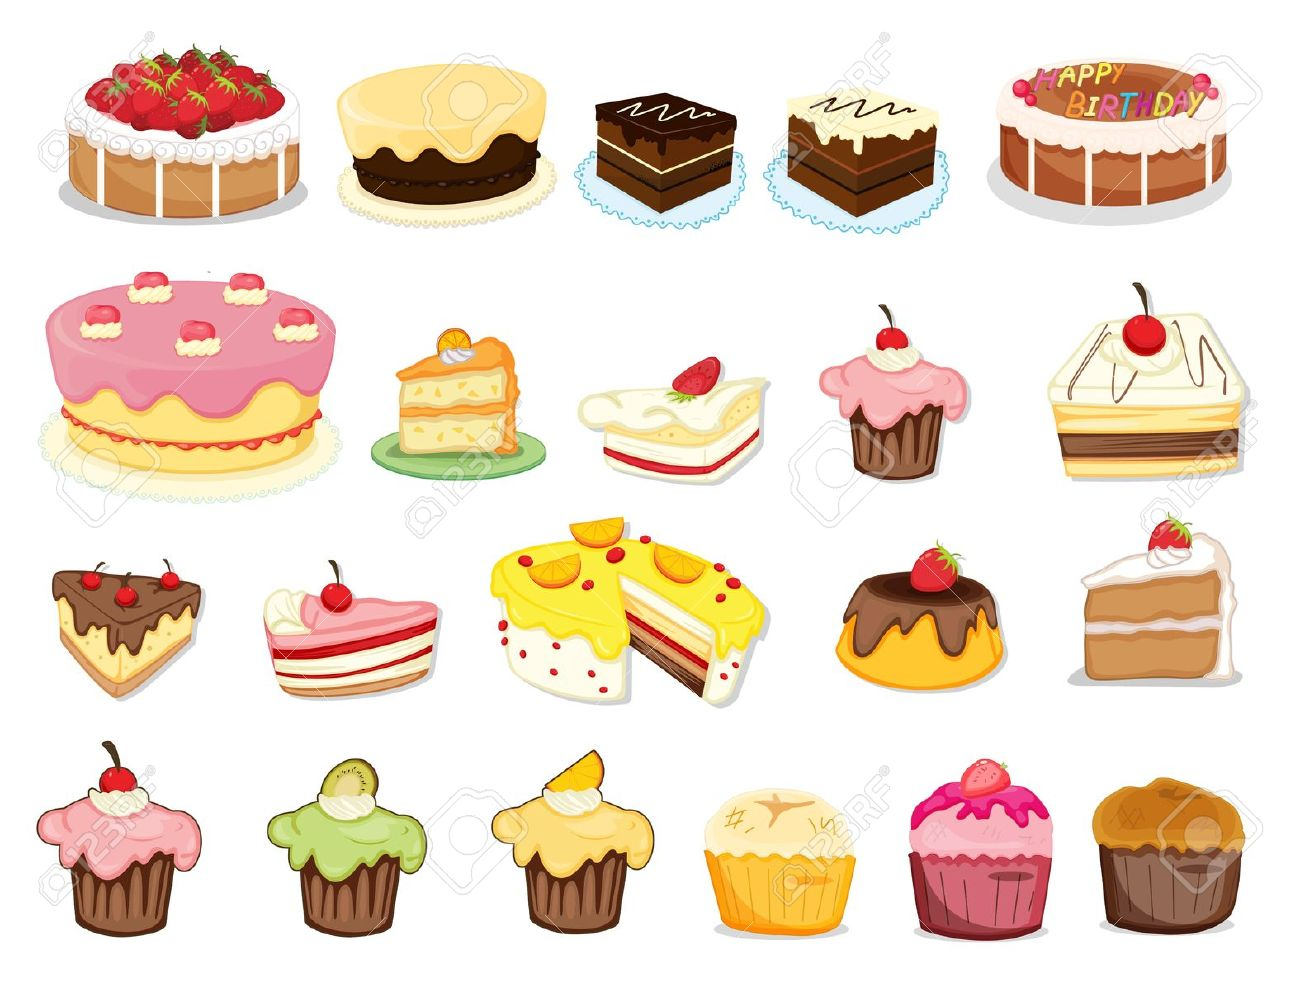 Desserts clipart.